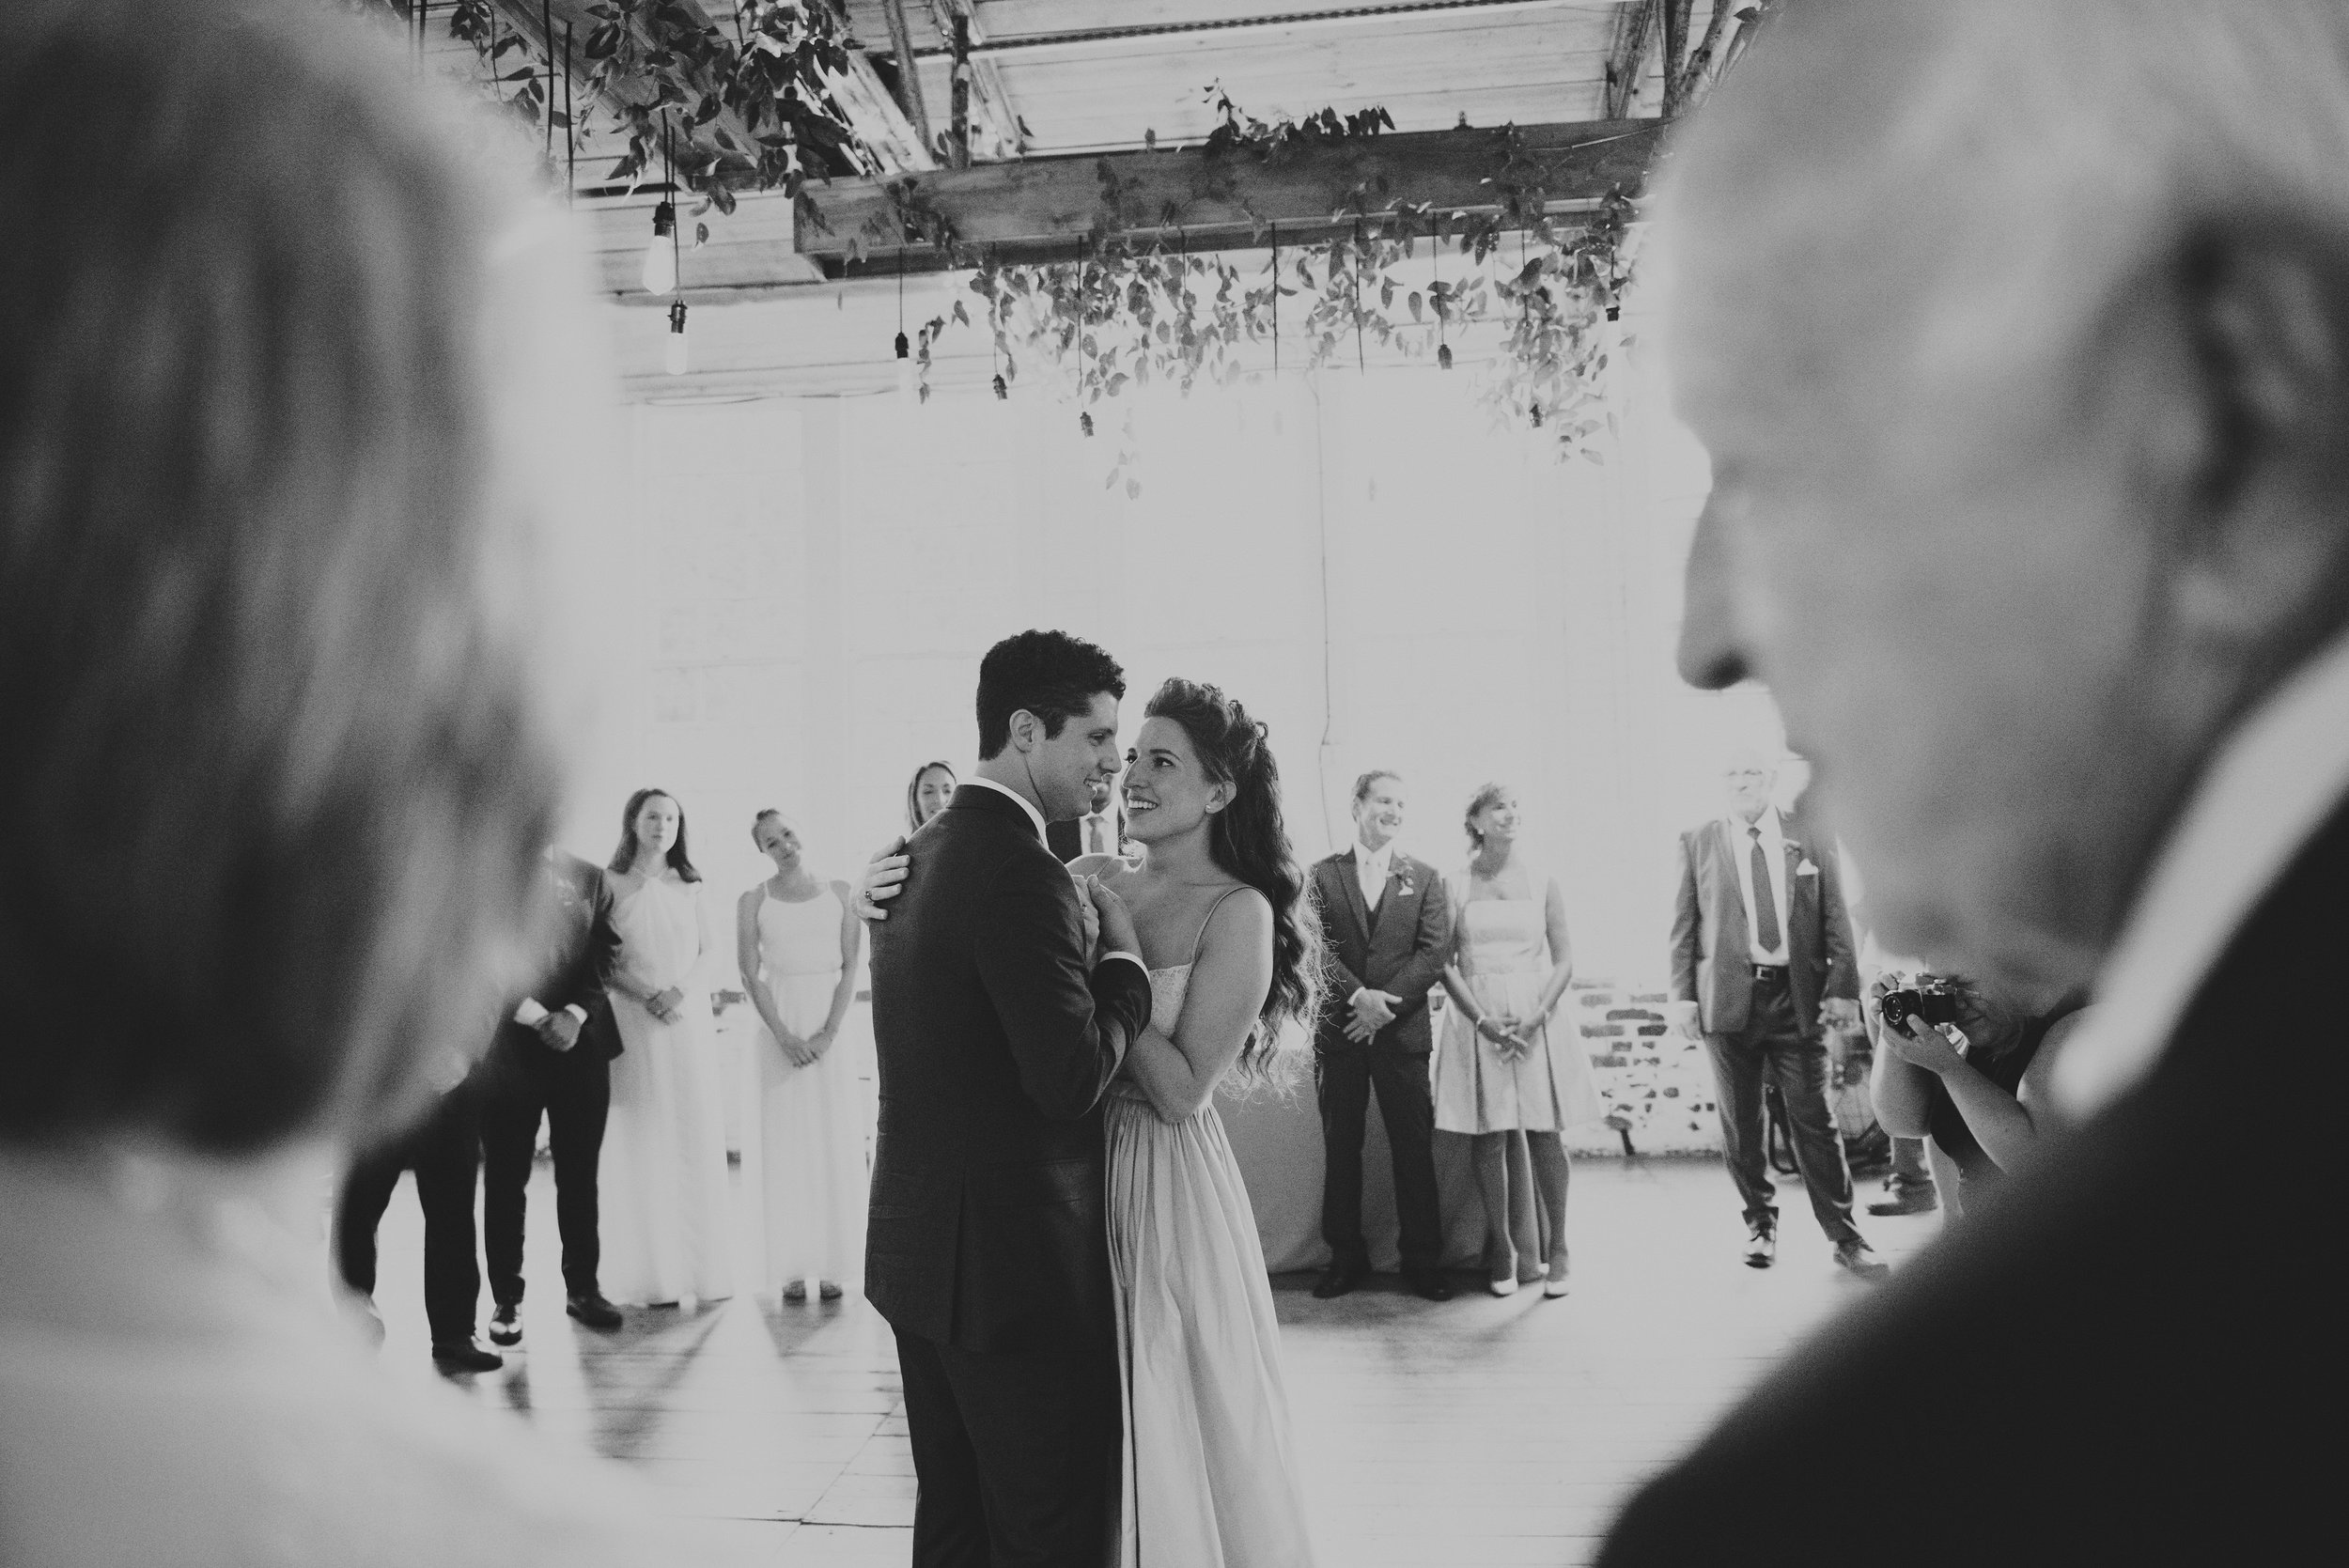 COPPER GEOMETRIC WEDDING LACE FACTORY WEDDING_022.jpg